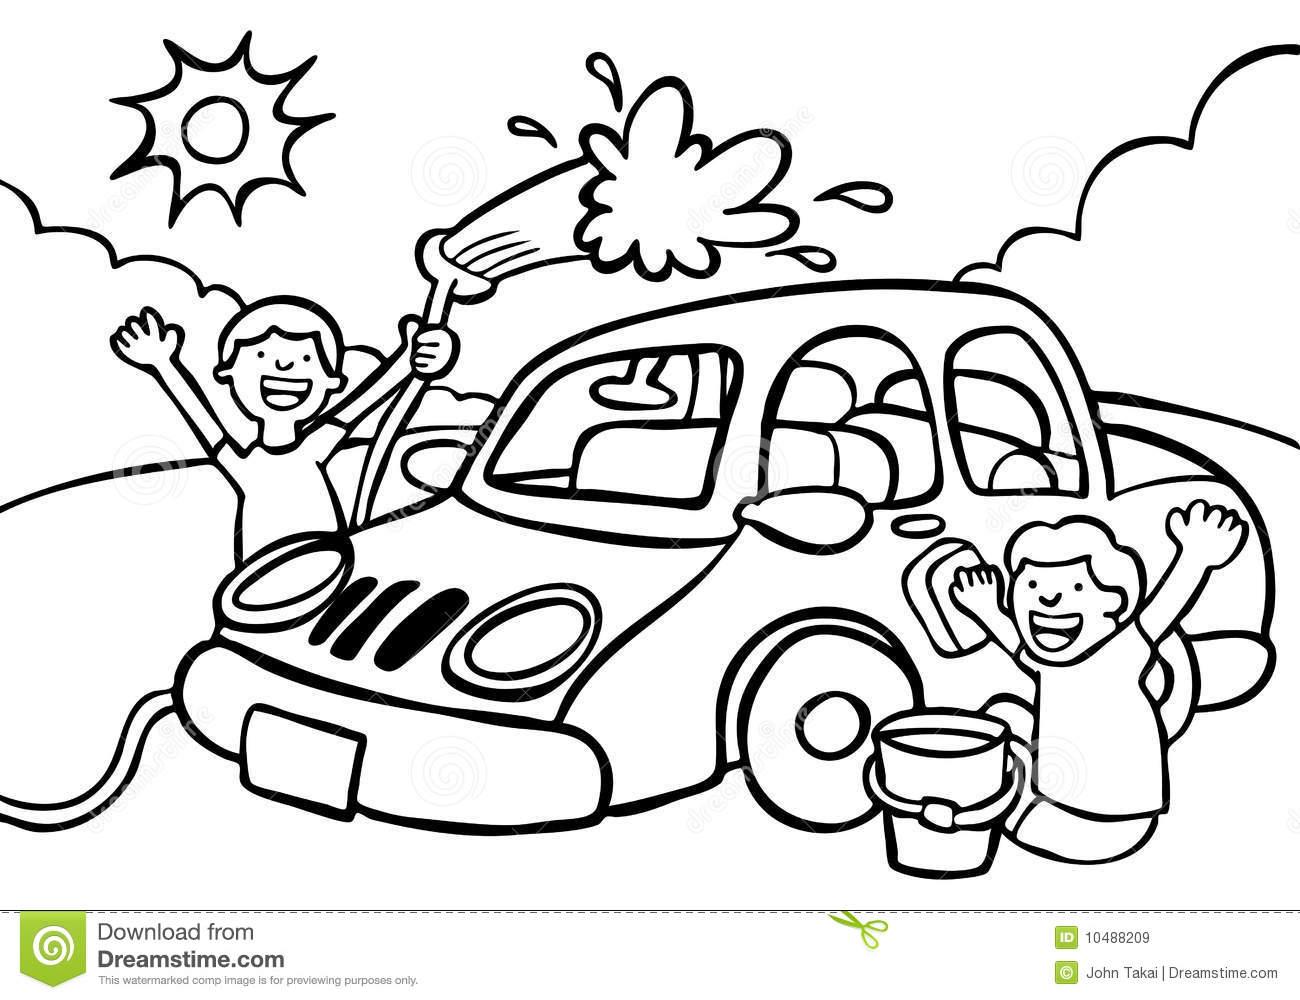 Car wash car clipart clip royalty free Wash the car clipart - ClipartFox clip royalty free